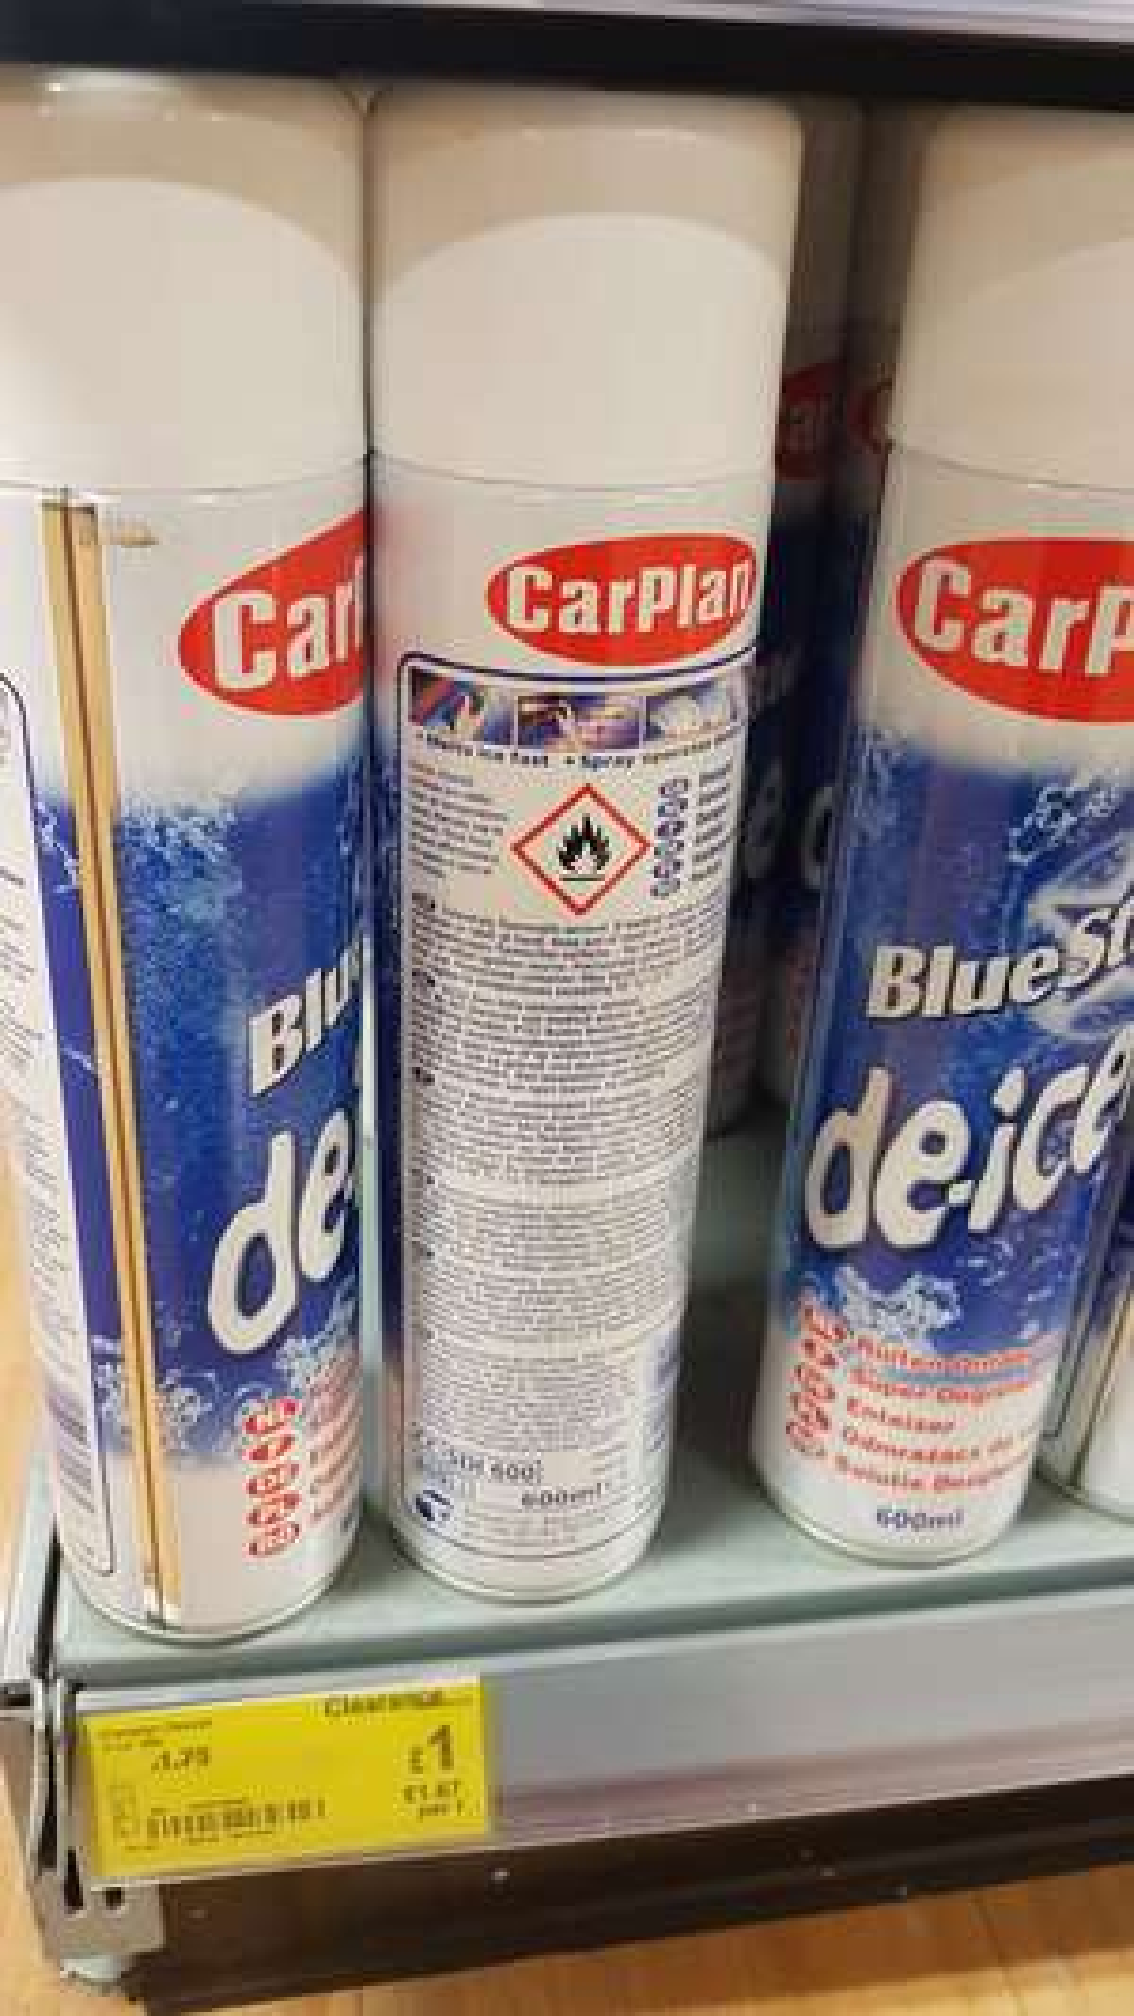 CarPlan De-icer 600ml -  £1 on clearance instore @ ASDA